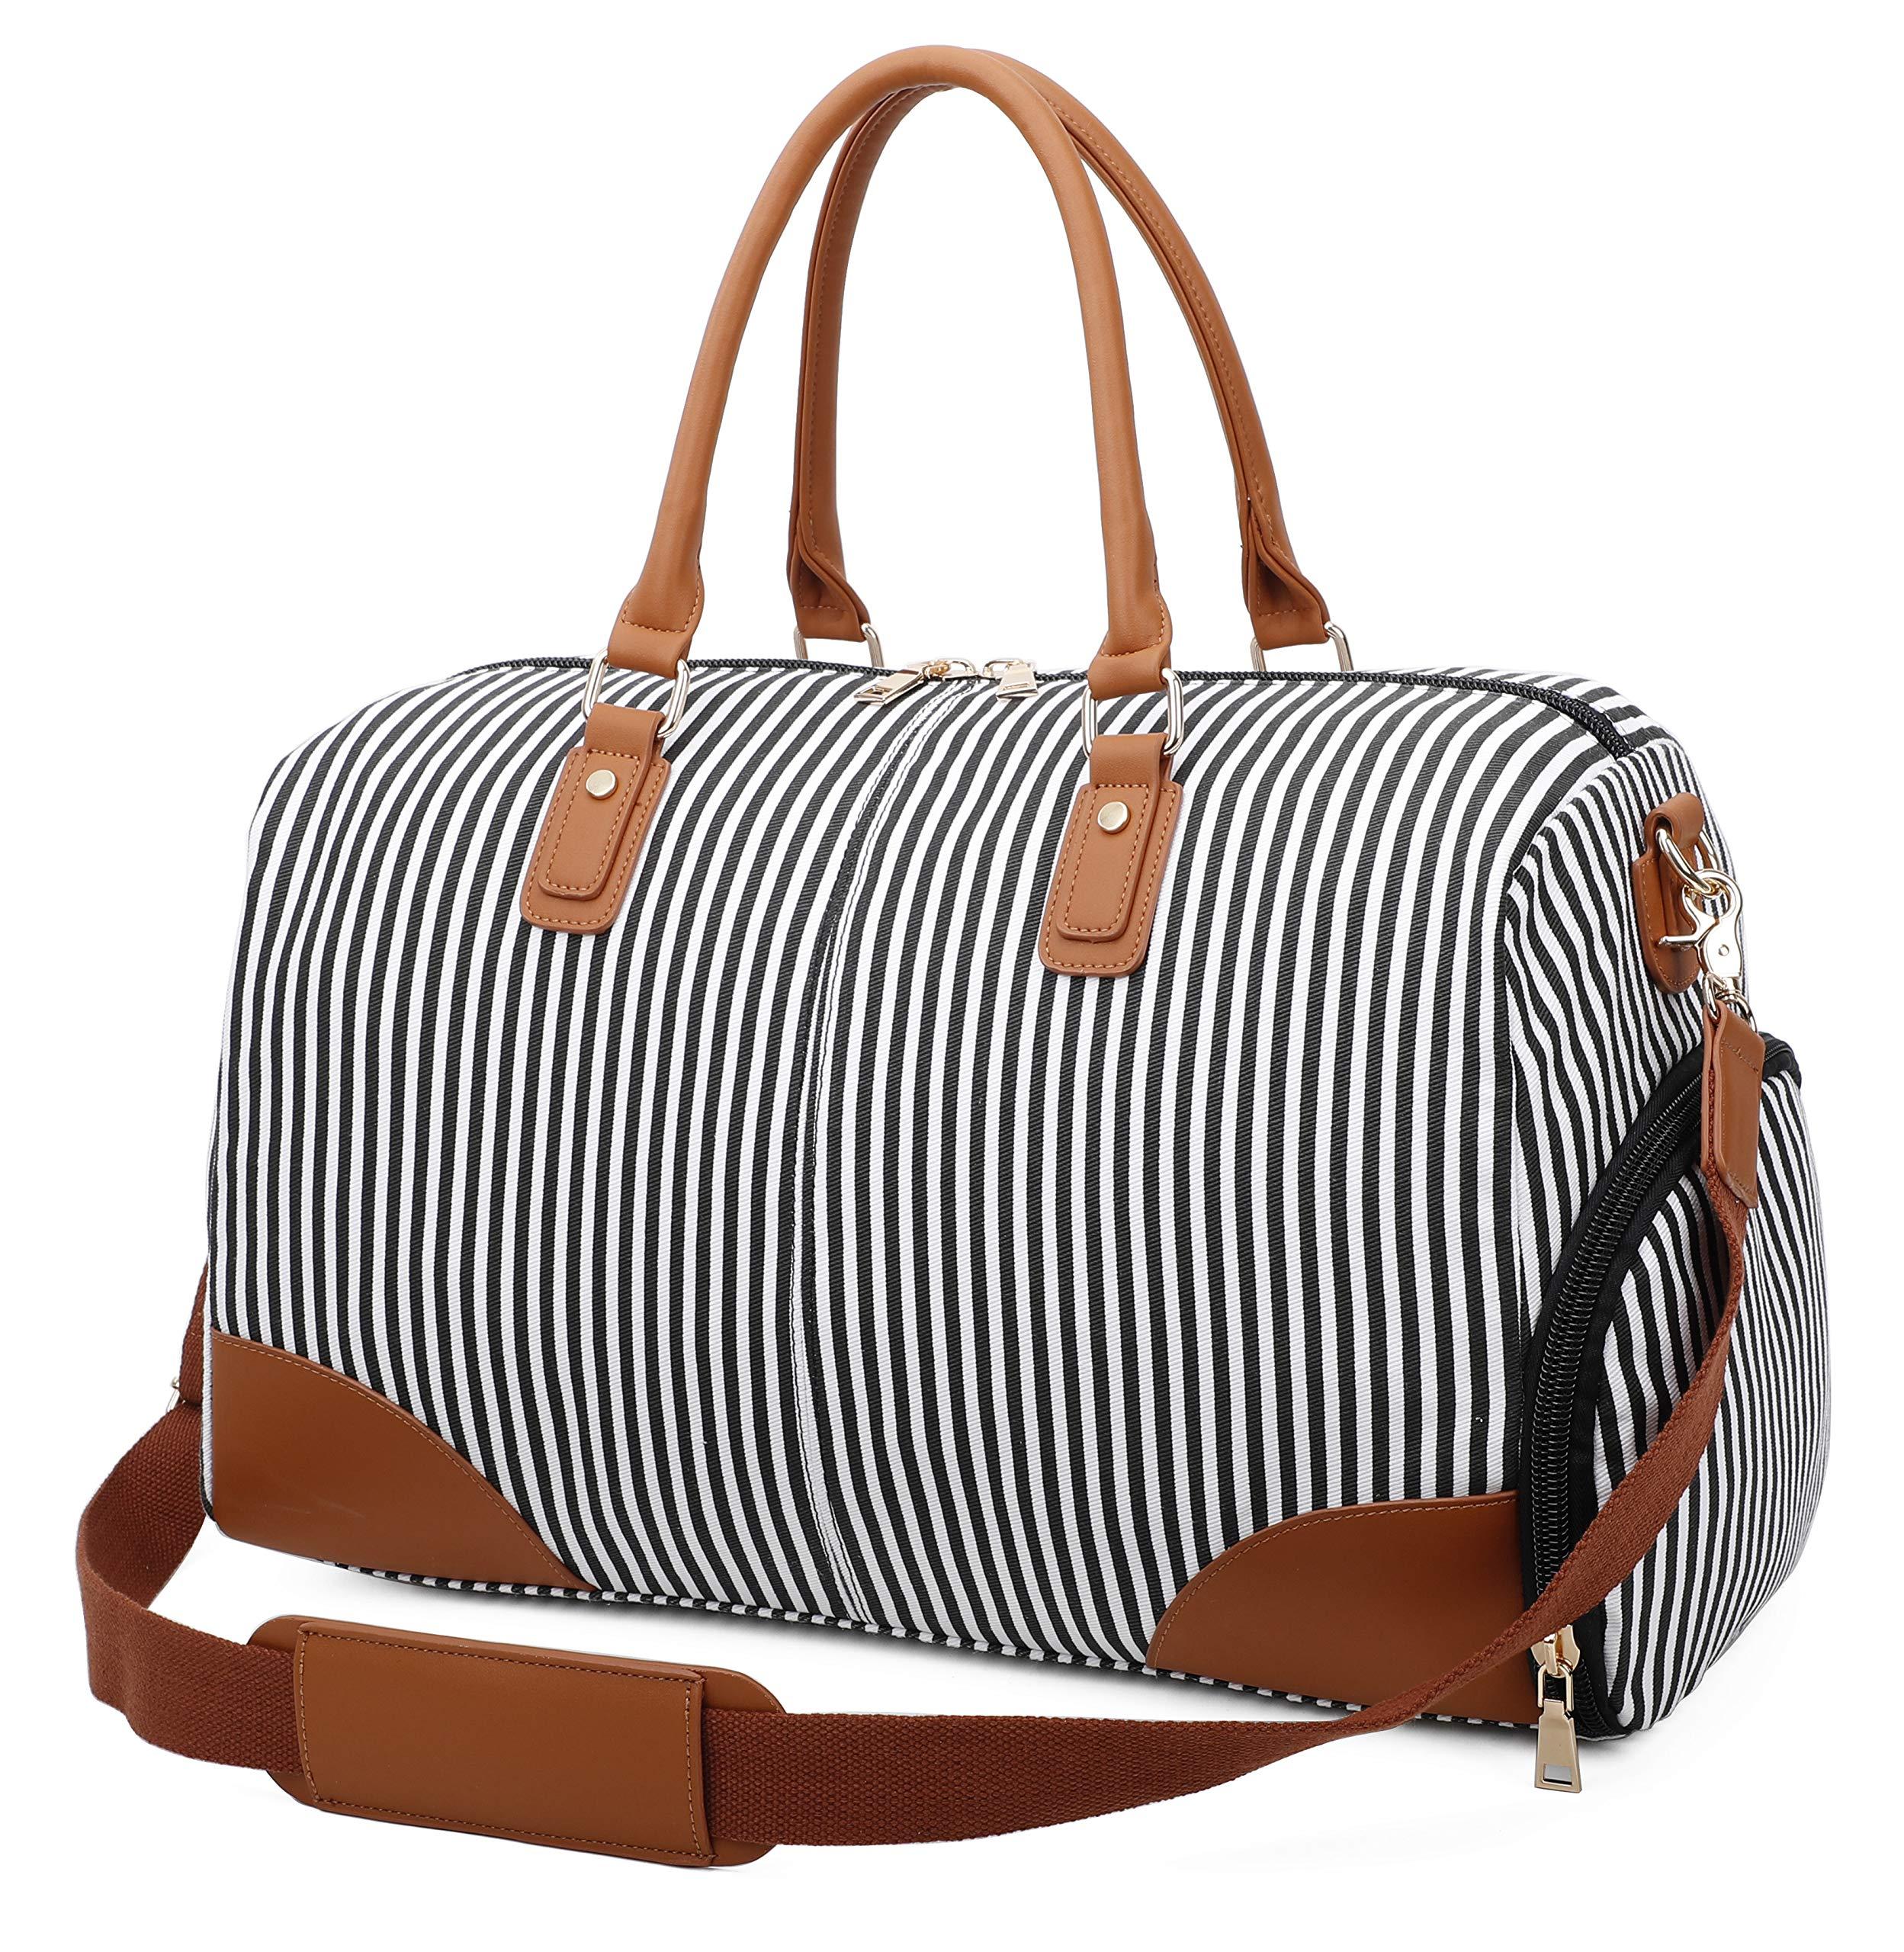 Gimay Weekend Bolsa de viaje Mujer Overnight Duffle Canvas Tote Bags ... (Negro)